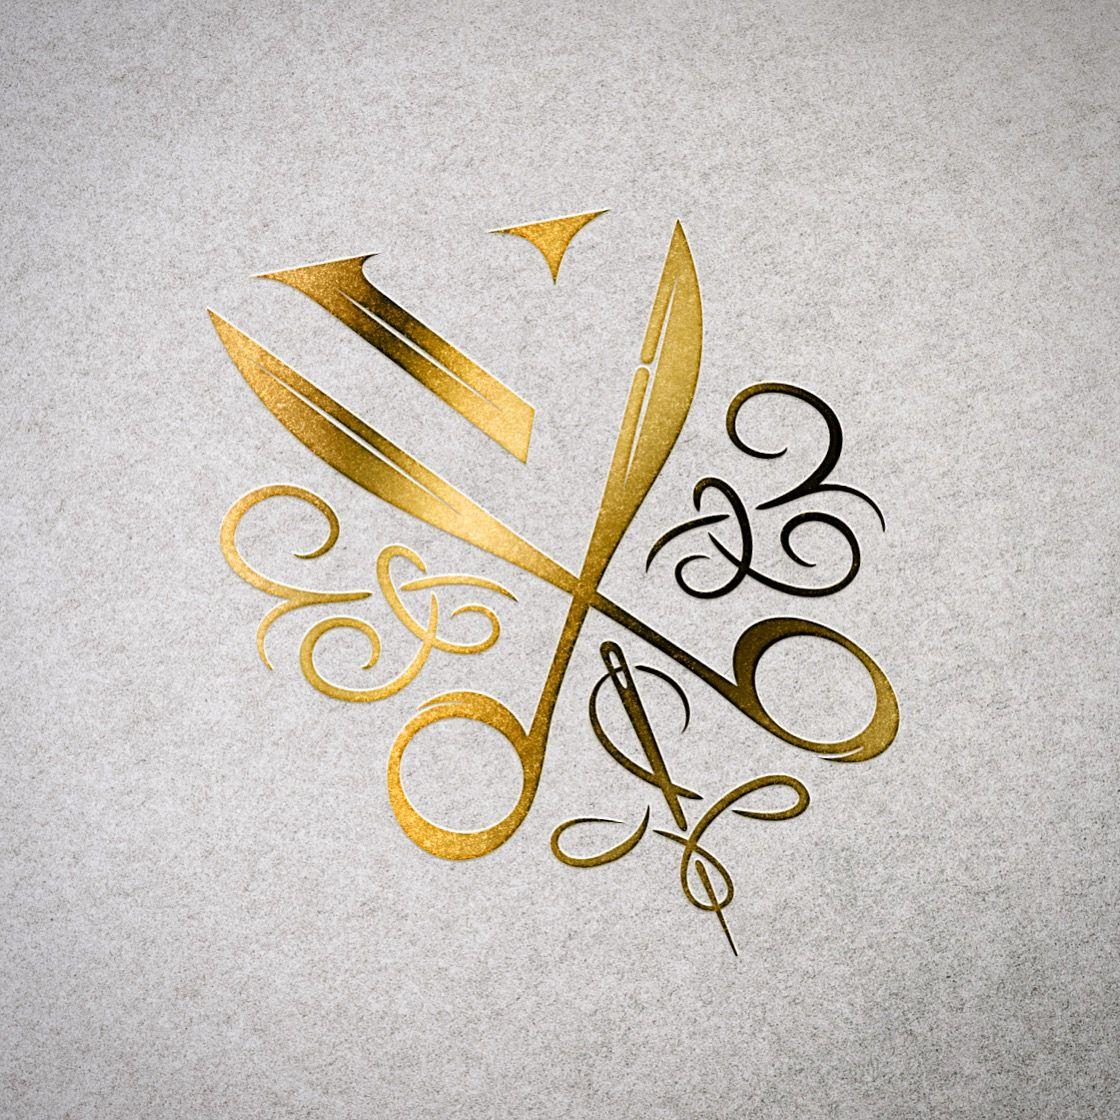 Tailor logo by trip estudiotrip graphic design tailor logo by trip estudiotrip magicingreecefo Image collections